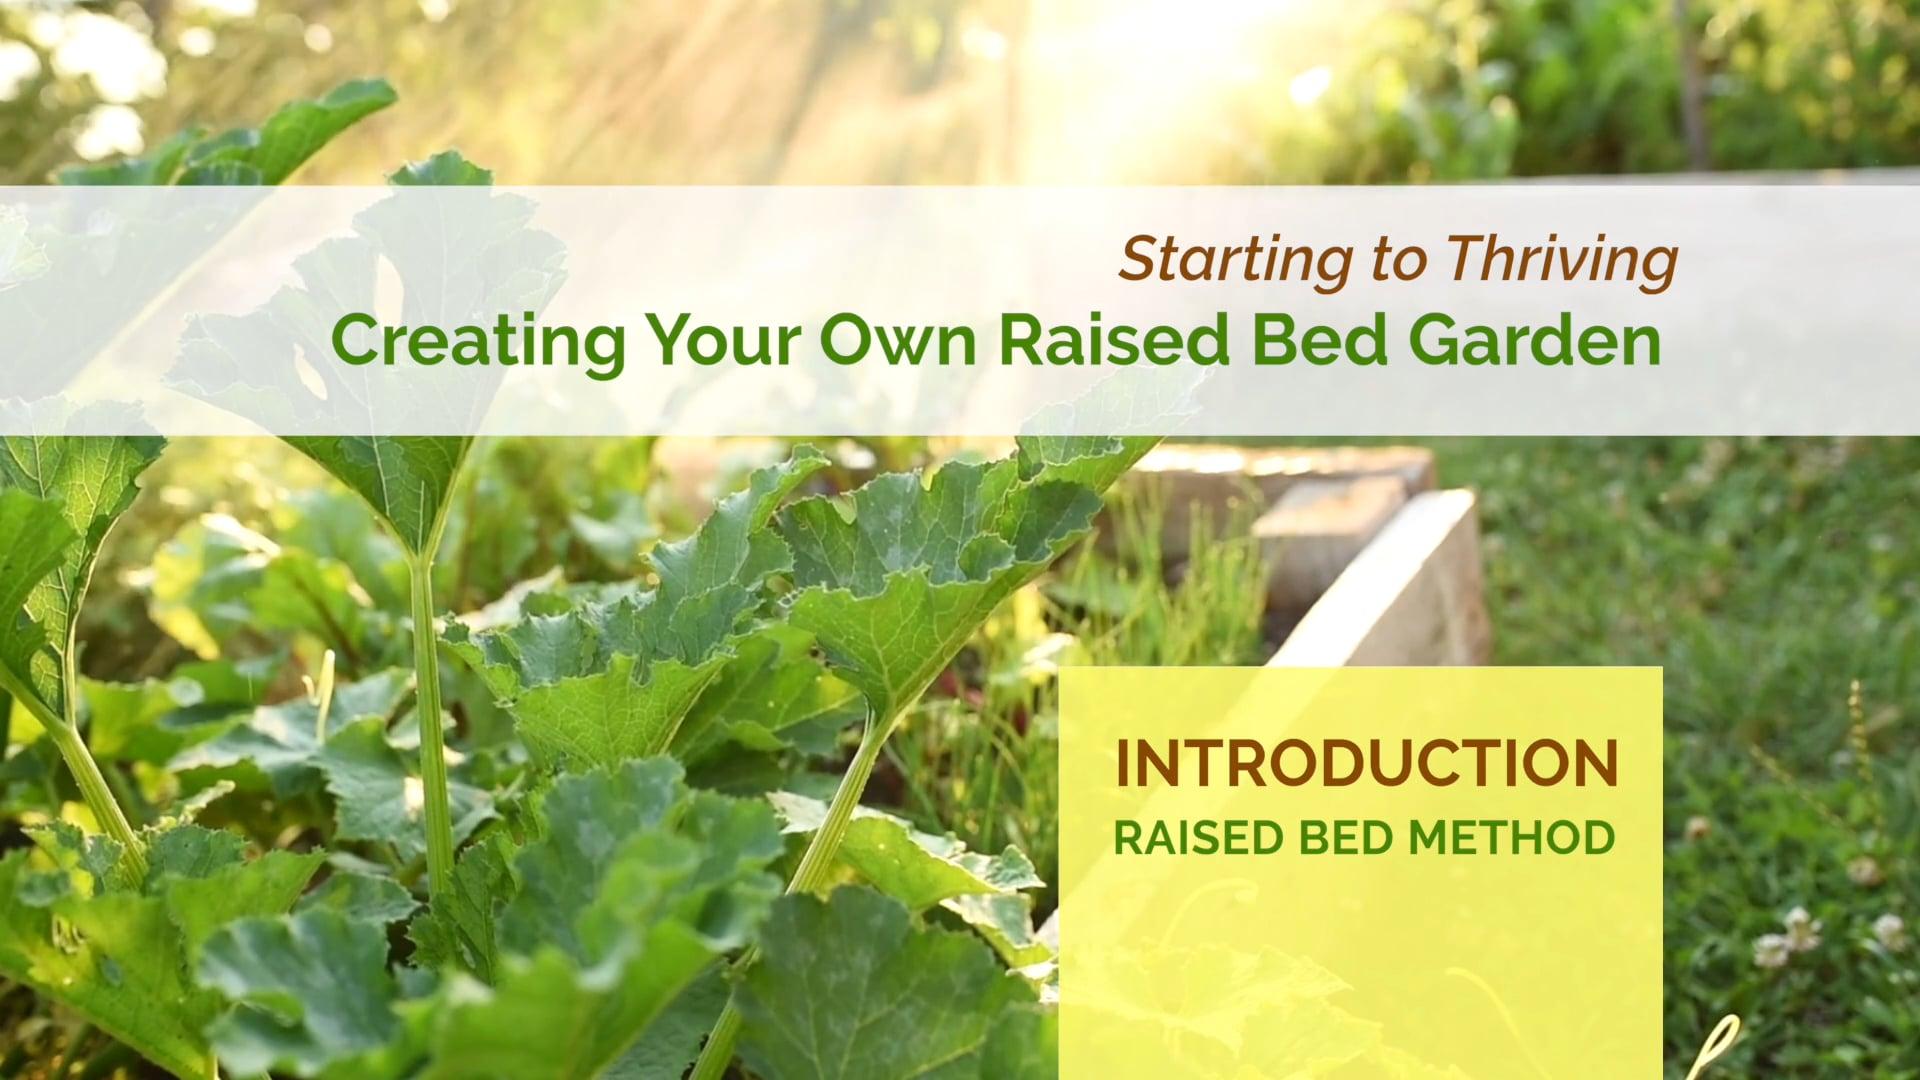 #1 Intro to Raised Bed Method